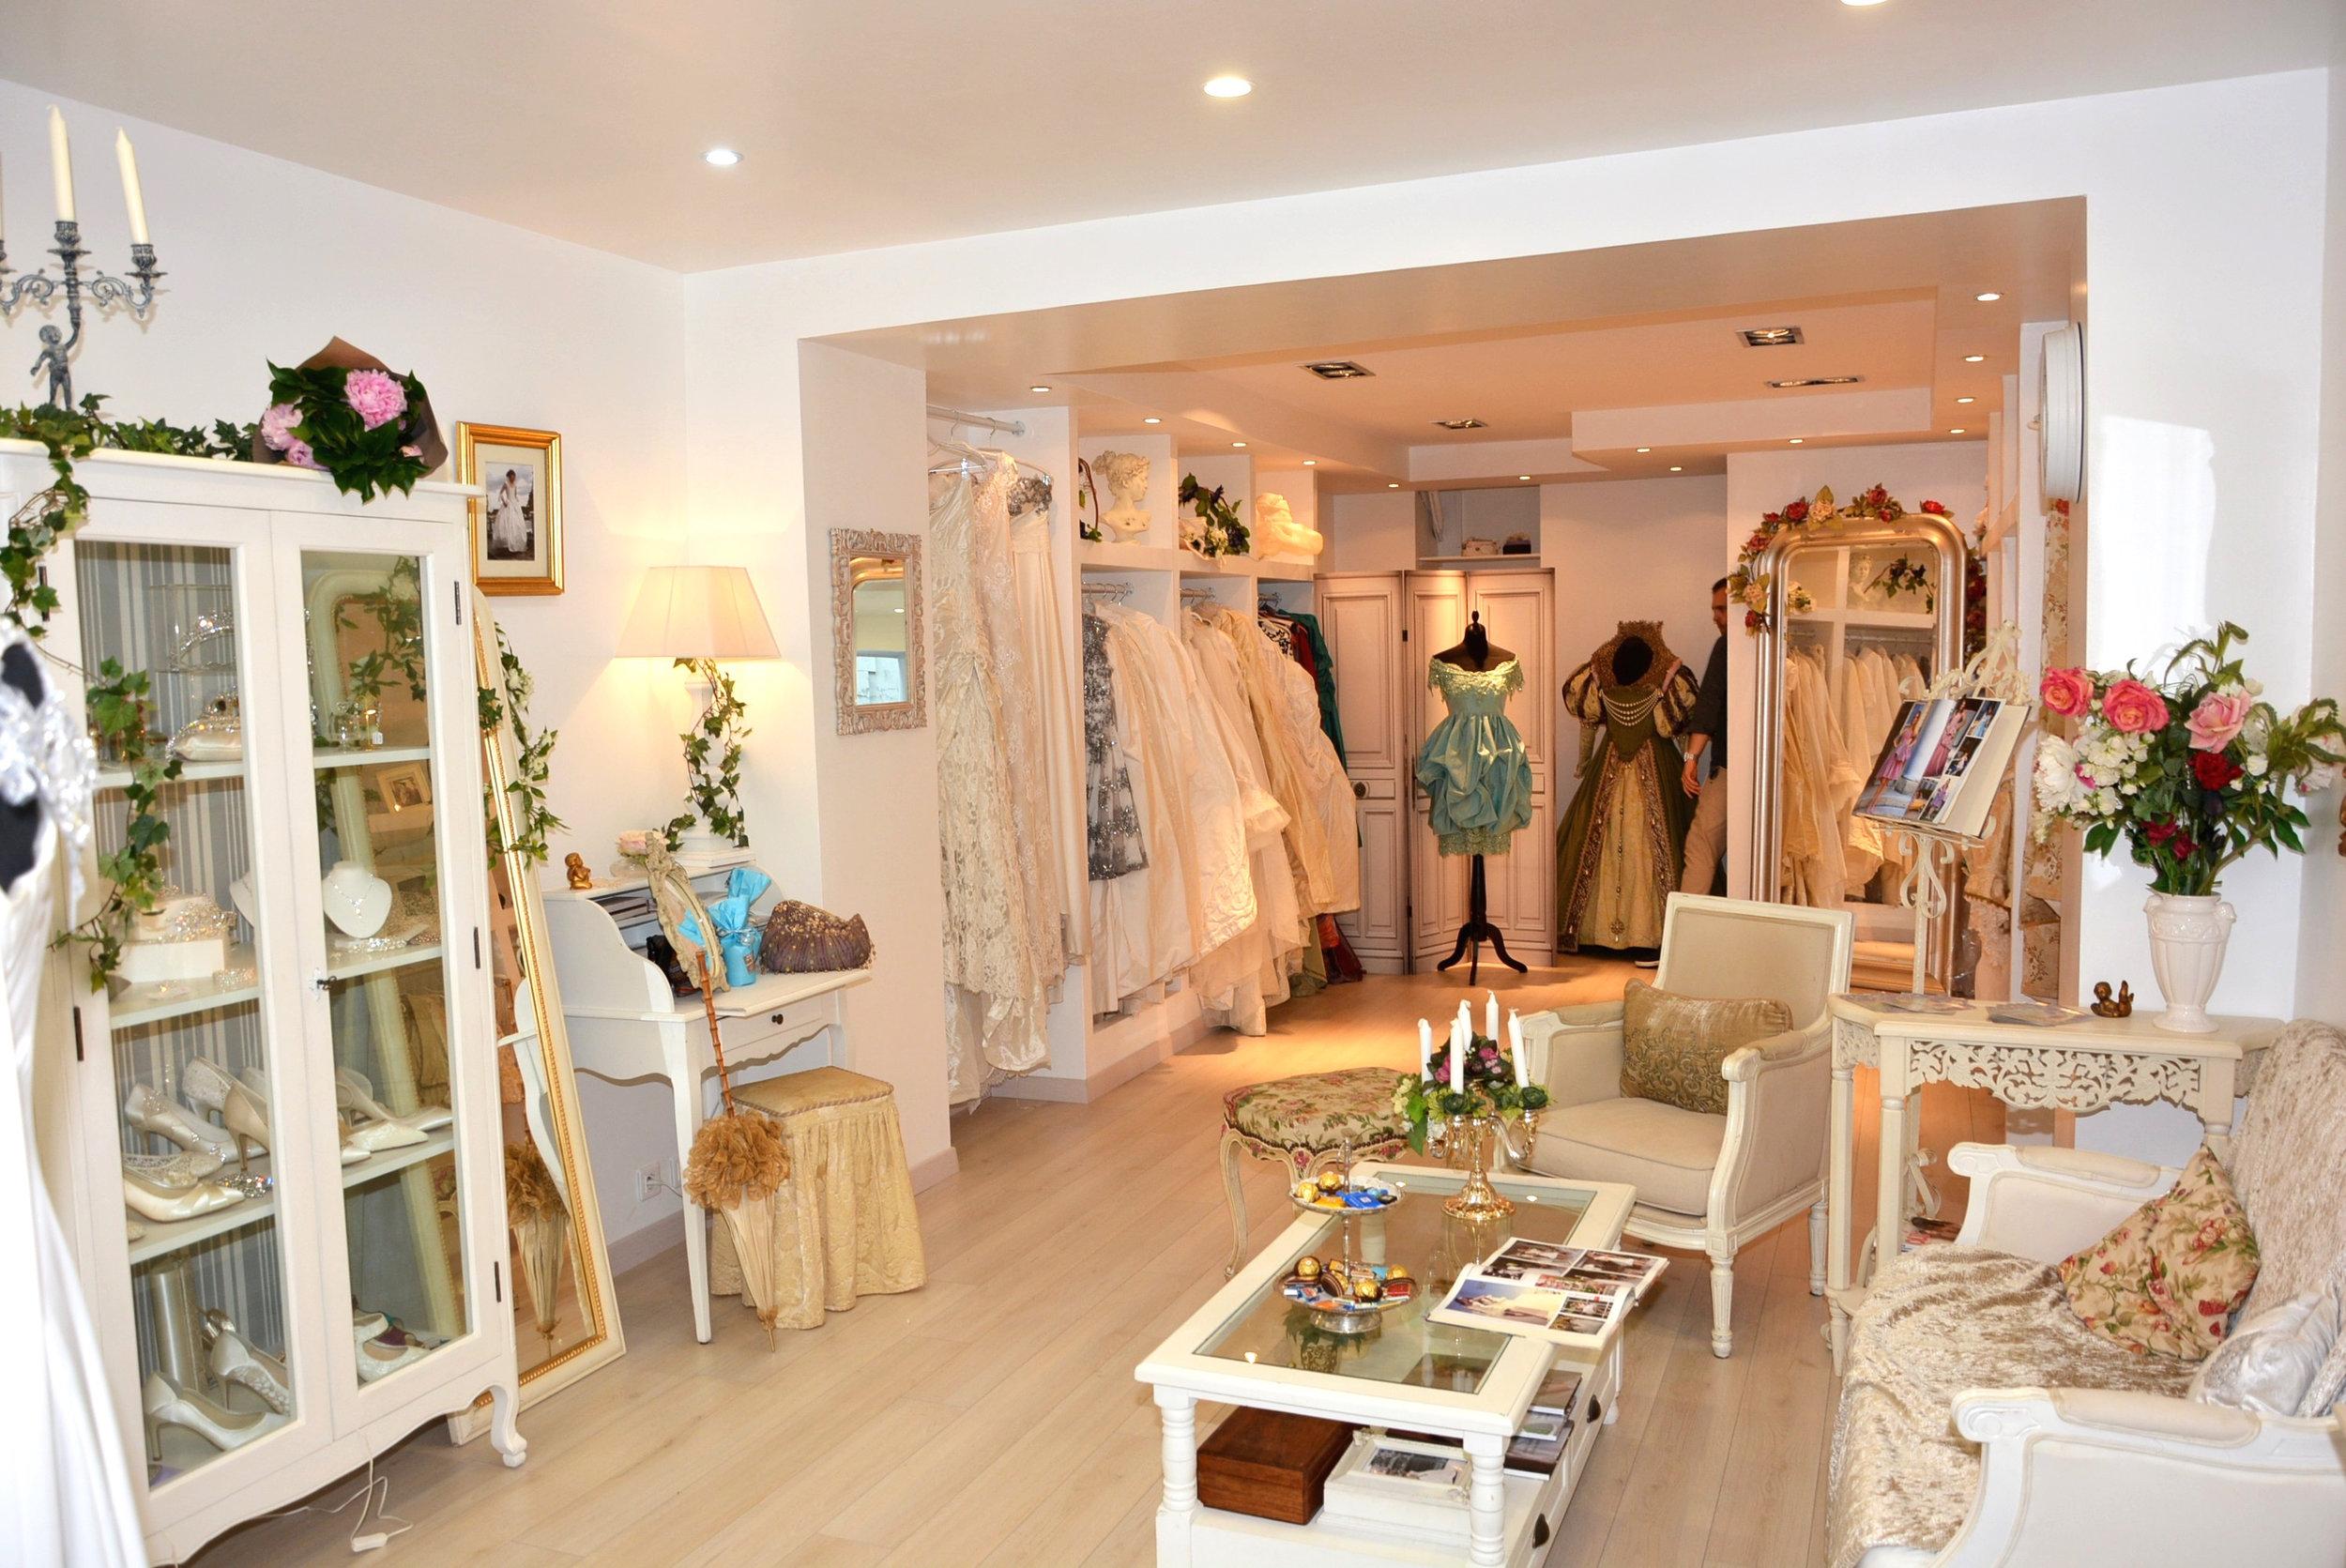 Boutique Agnes Szabelewski2016-06-23 marly_126.jpg